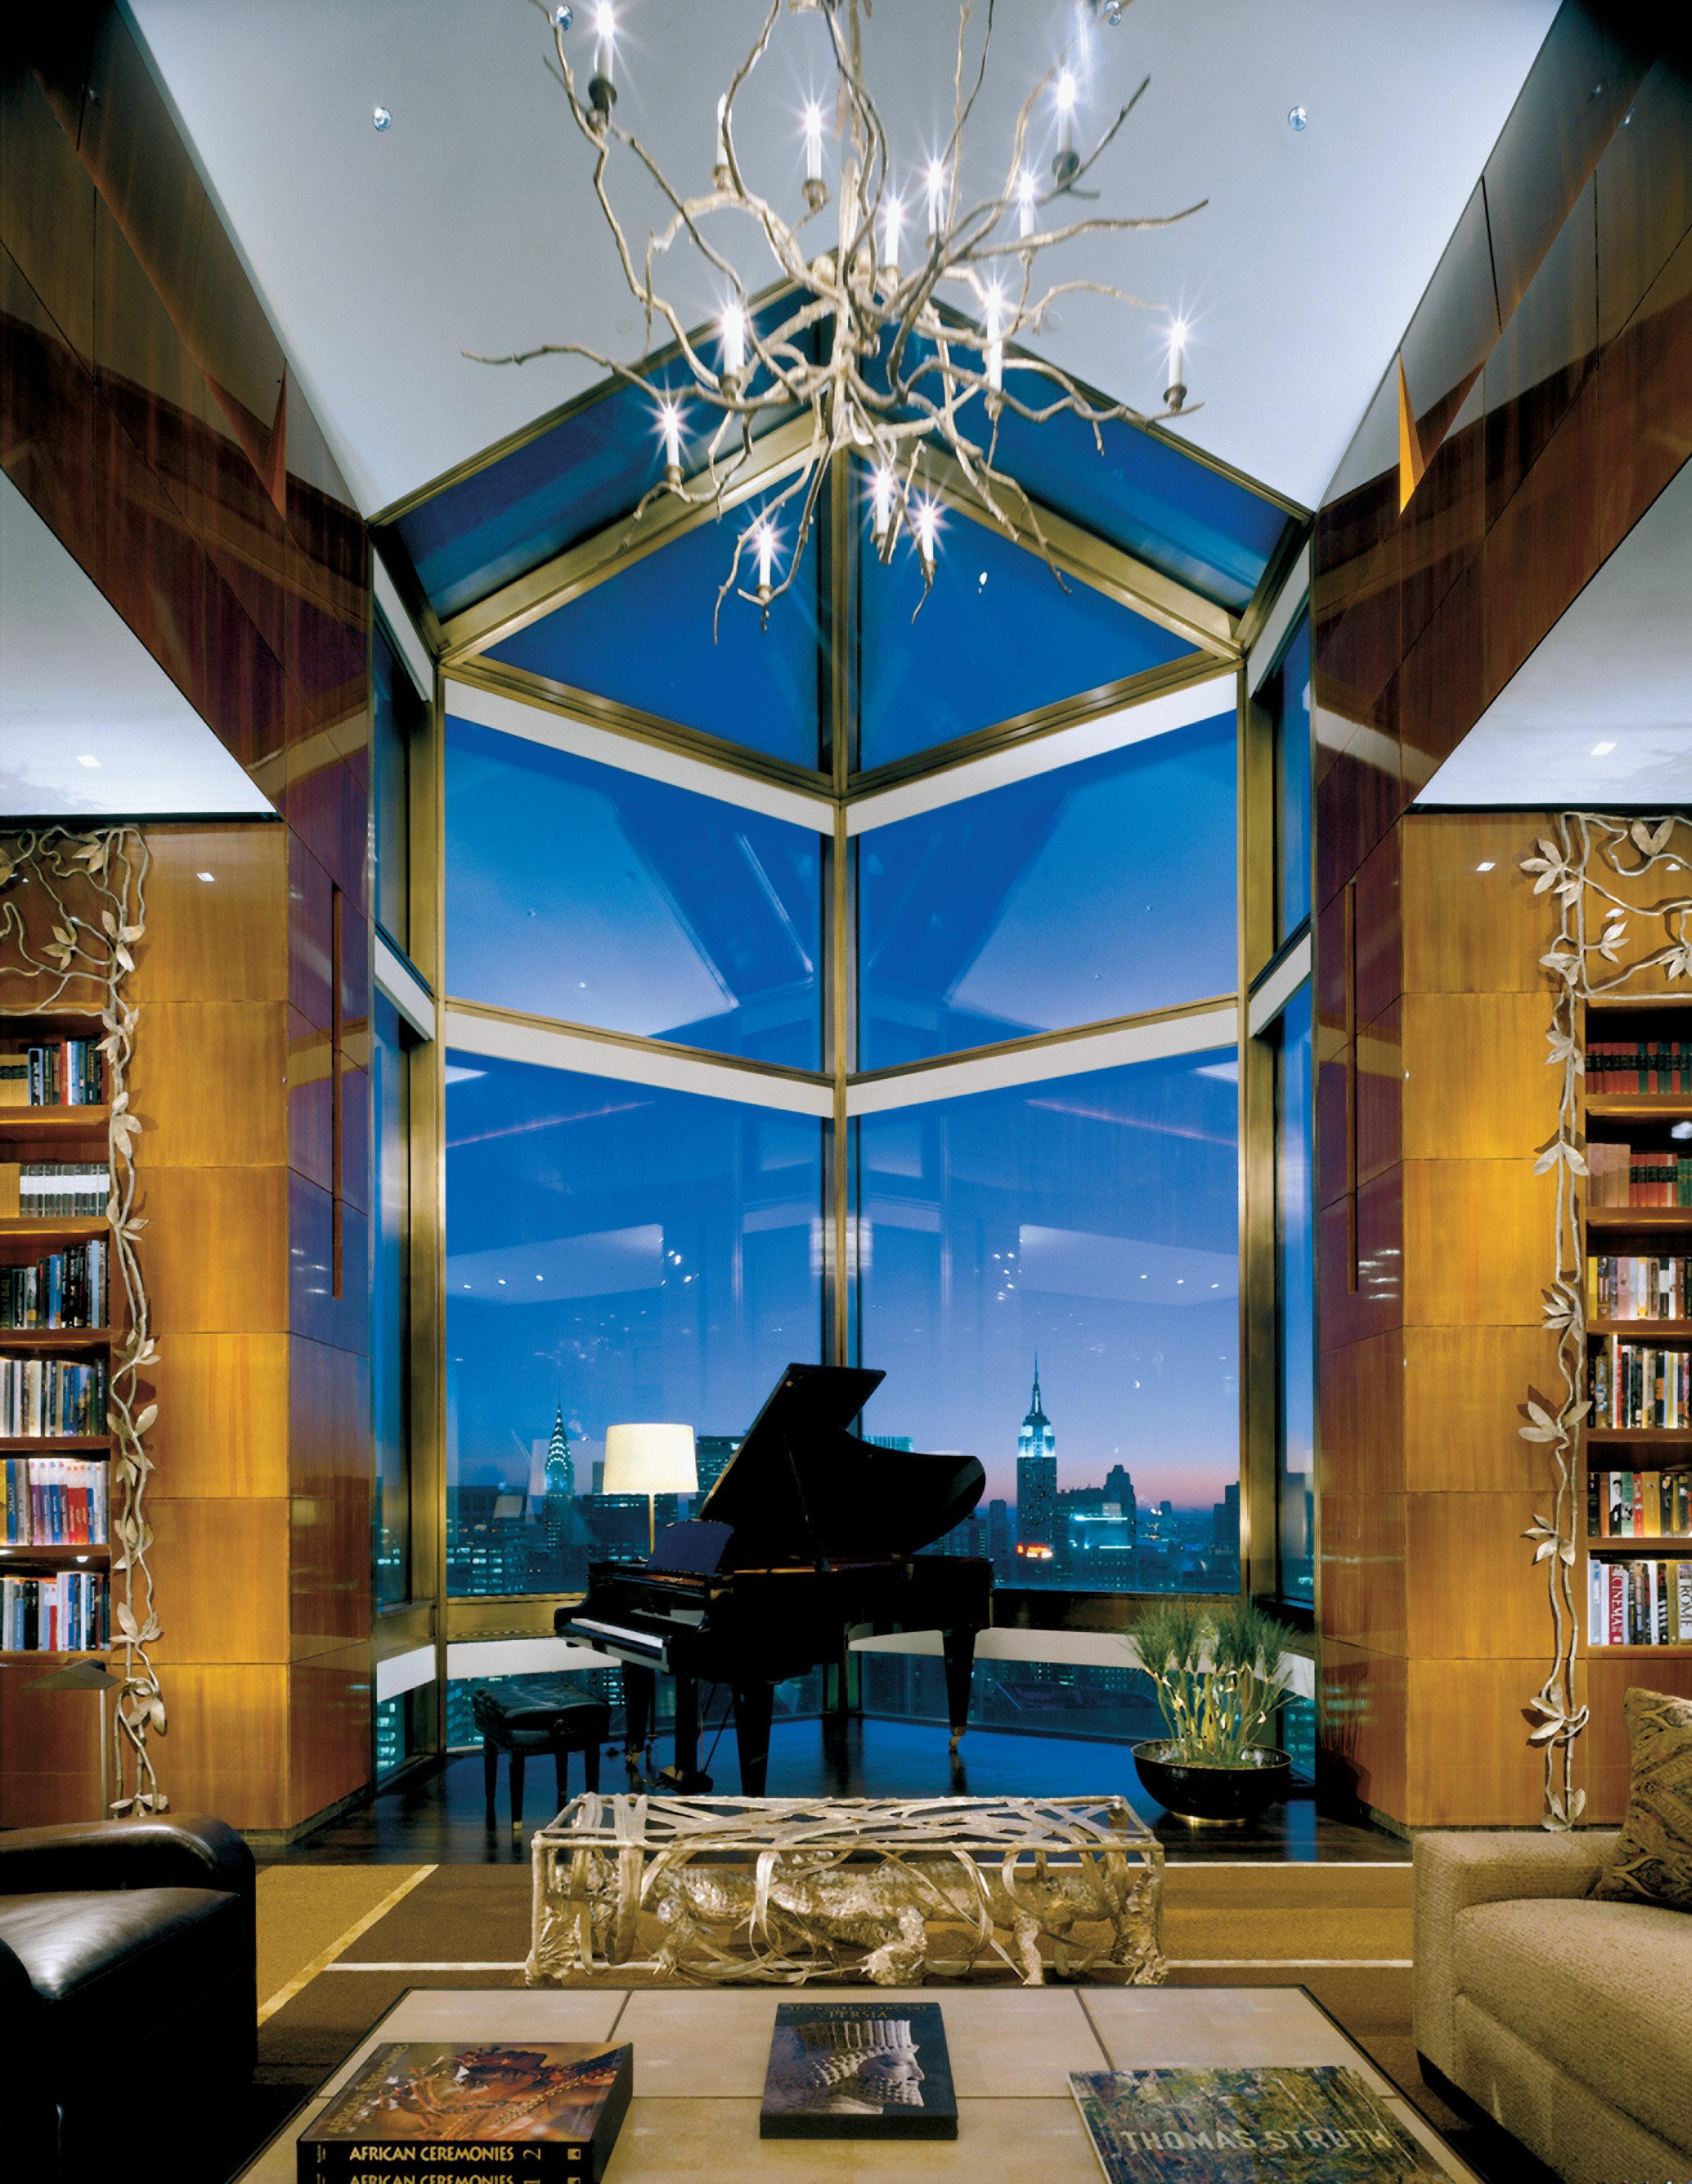 Hotels Luxury Travel indoor ceiling interior design Lobby living room daylighting window condominium apartment